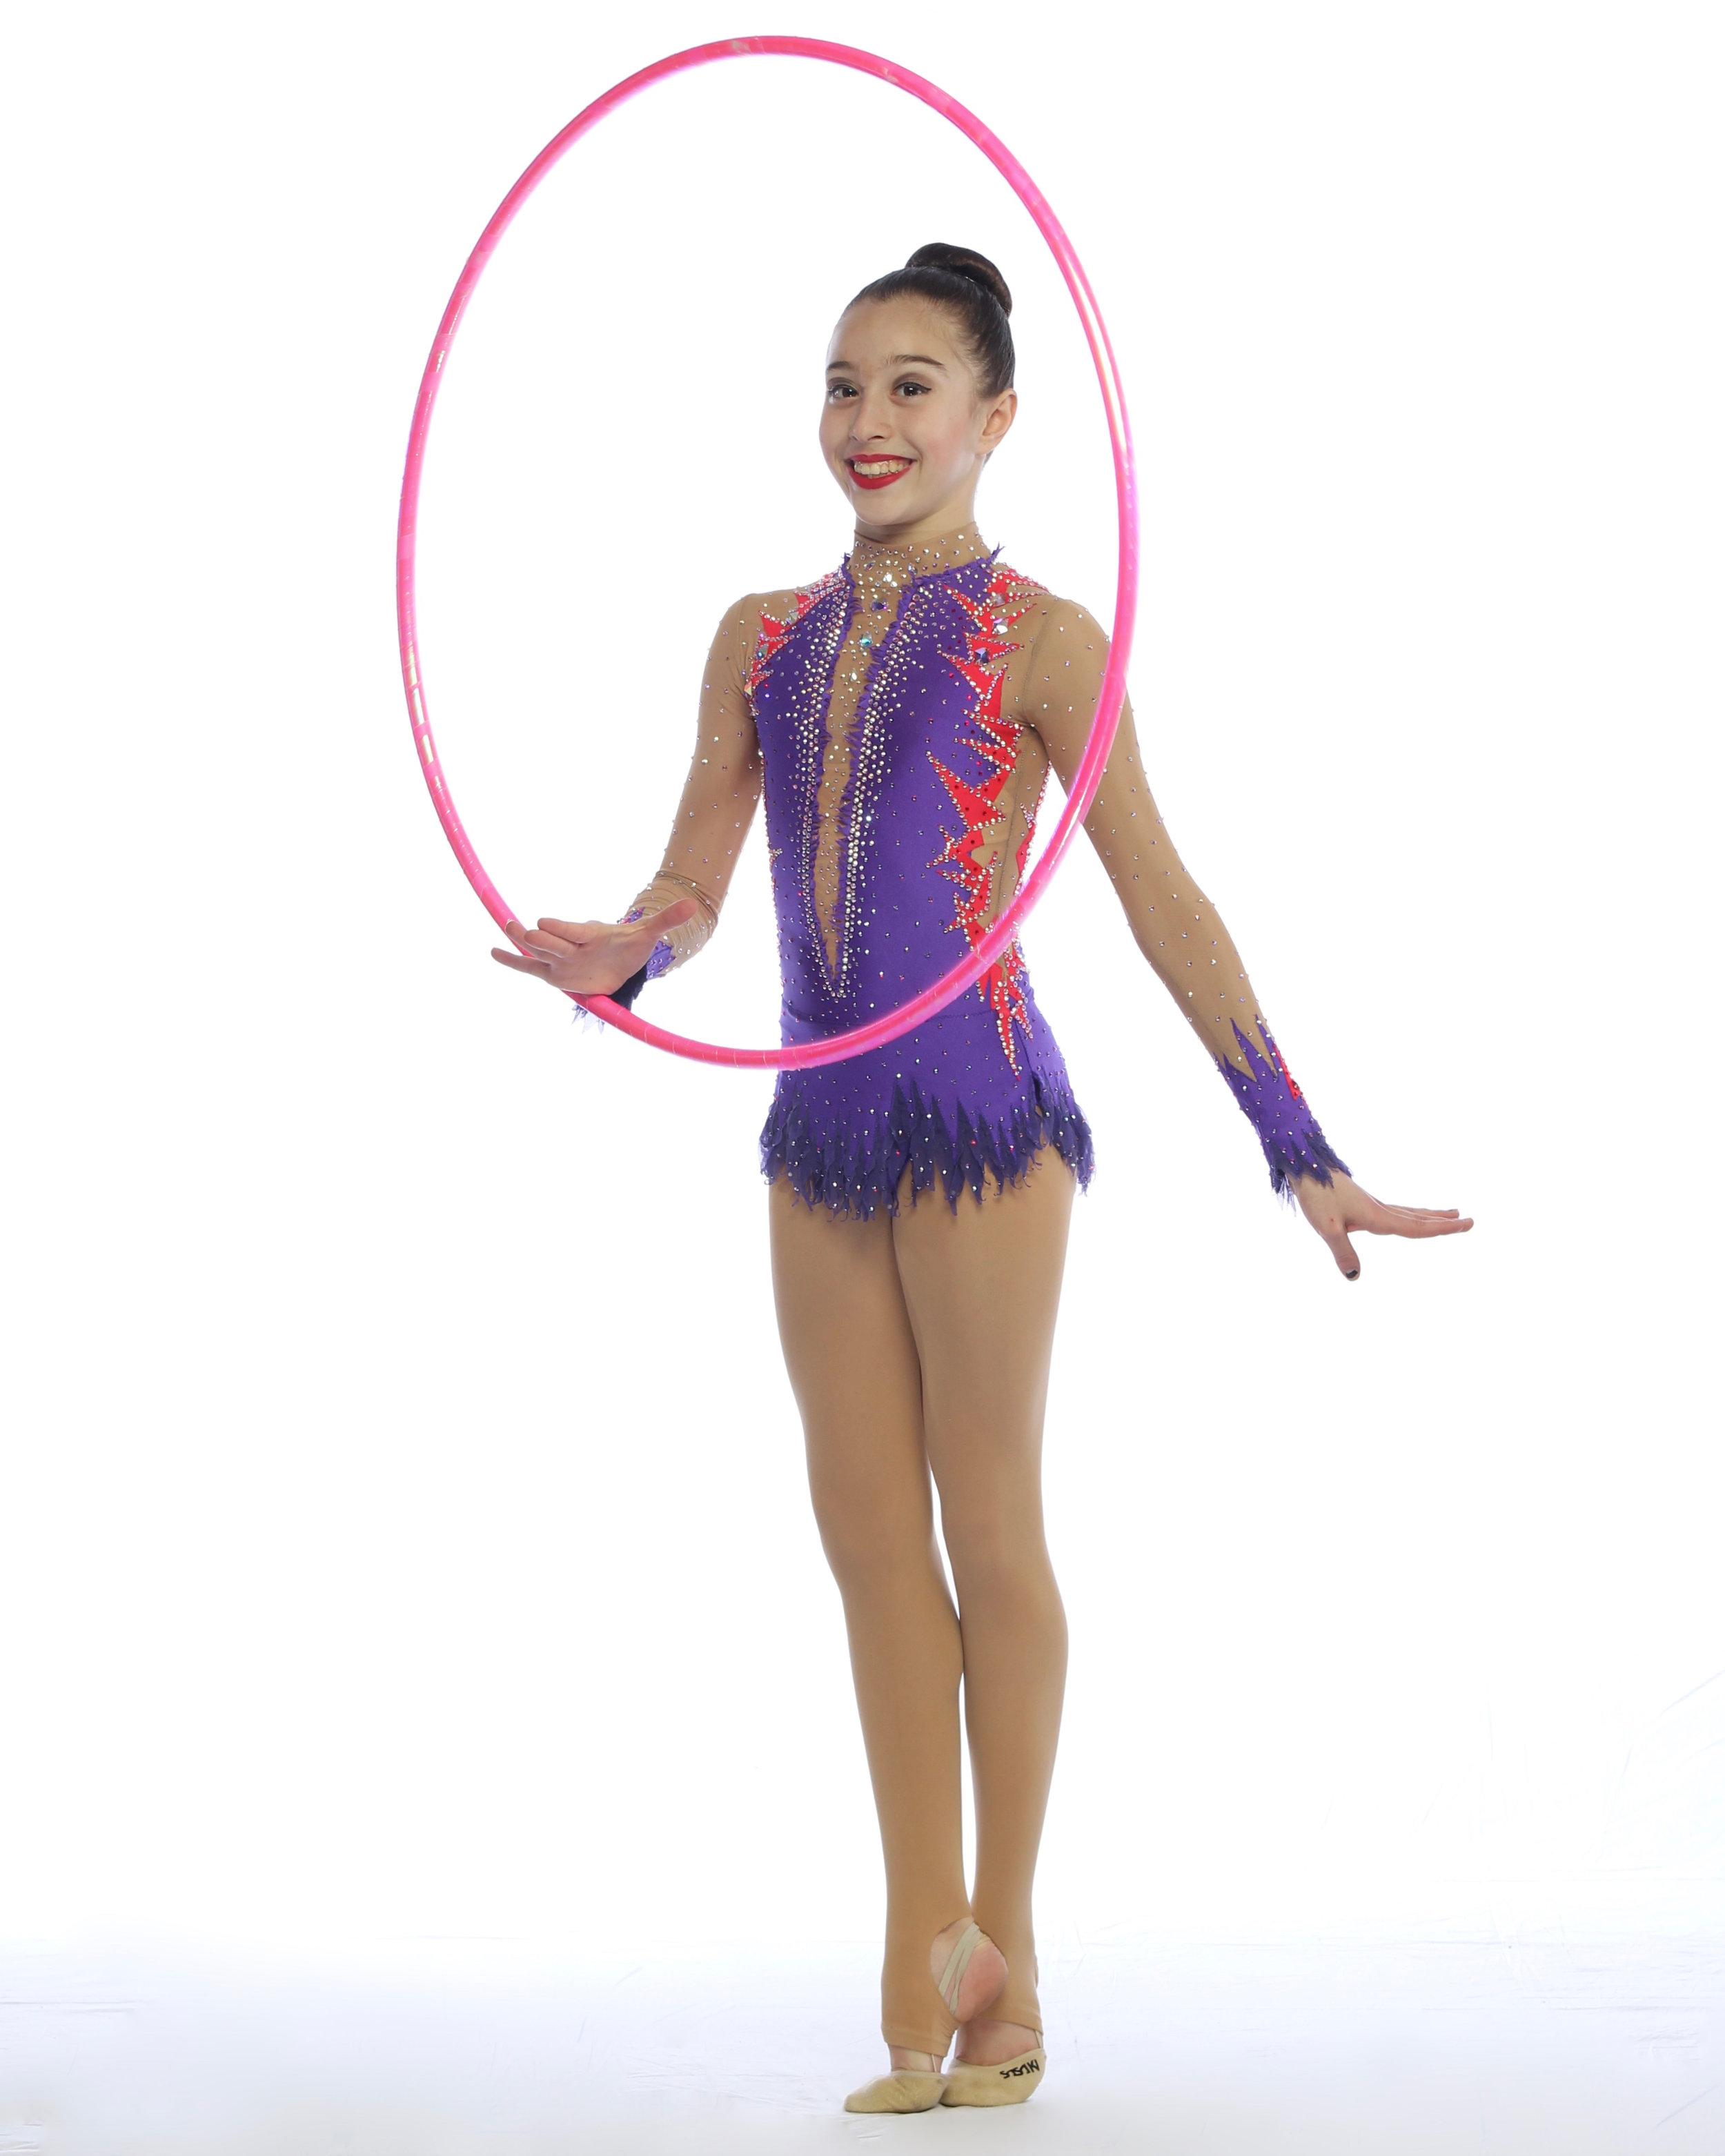 gymnast 5 - 1 copy (1).jpg